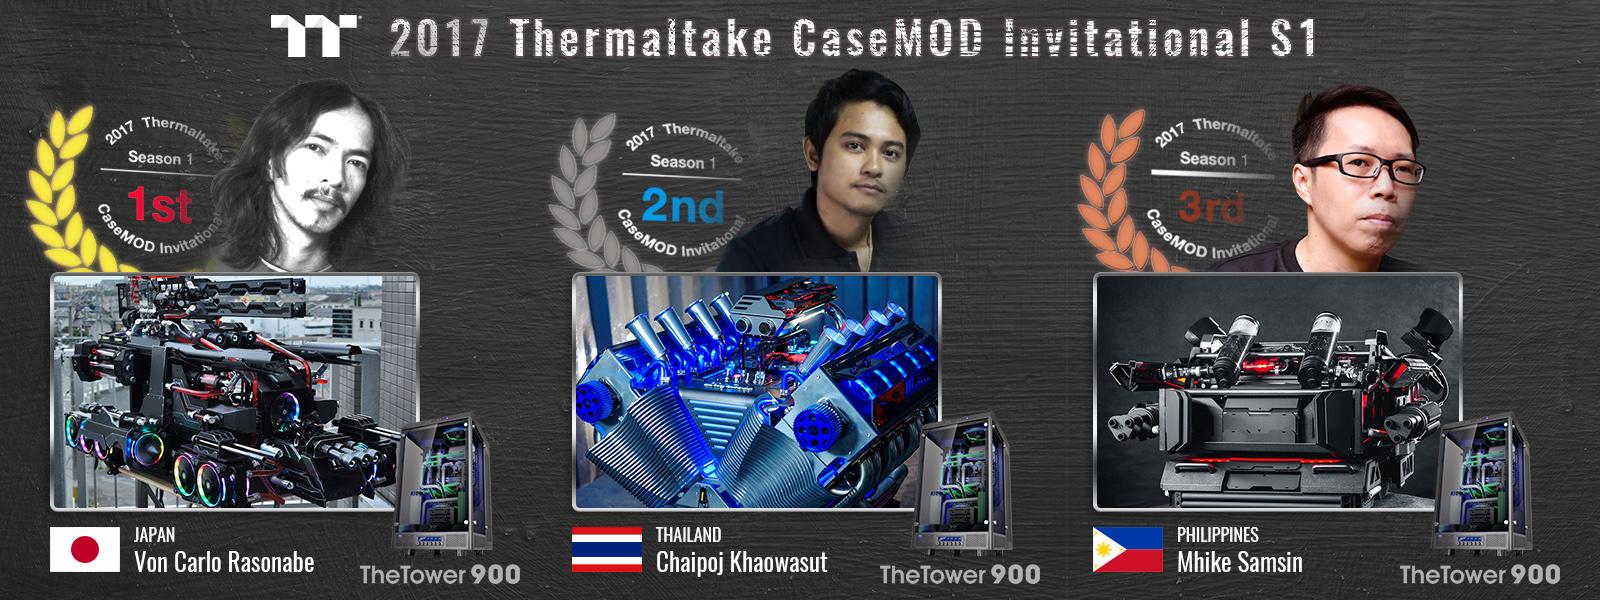 [MOD] Resultats du concours Thermaltake CaseMOD Invitational Season 1 2017